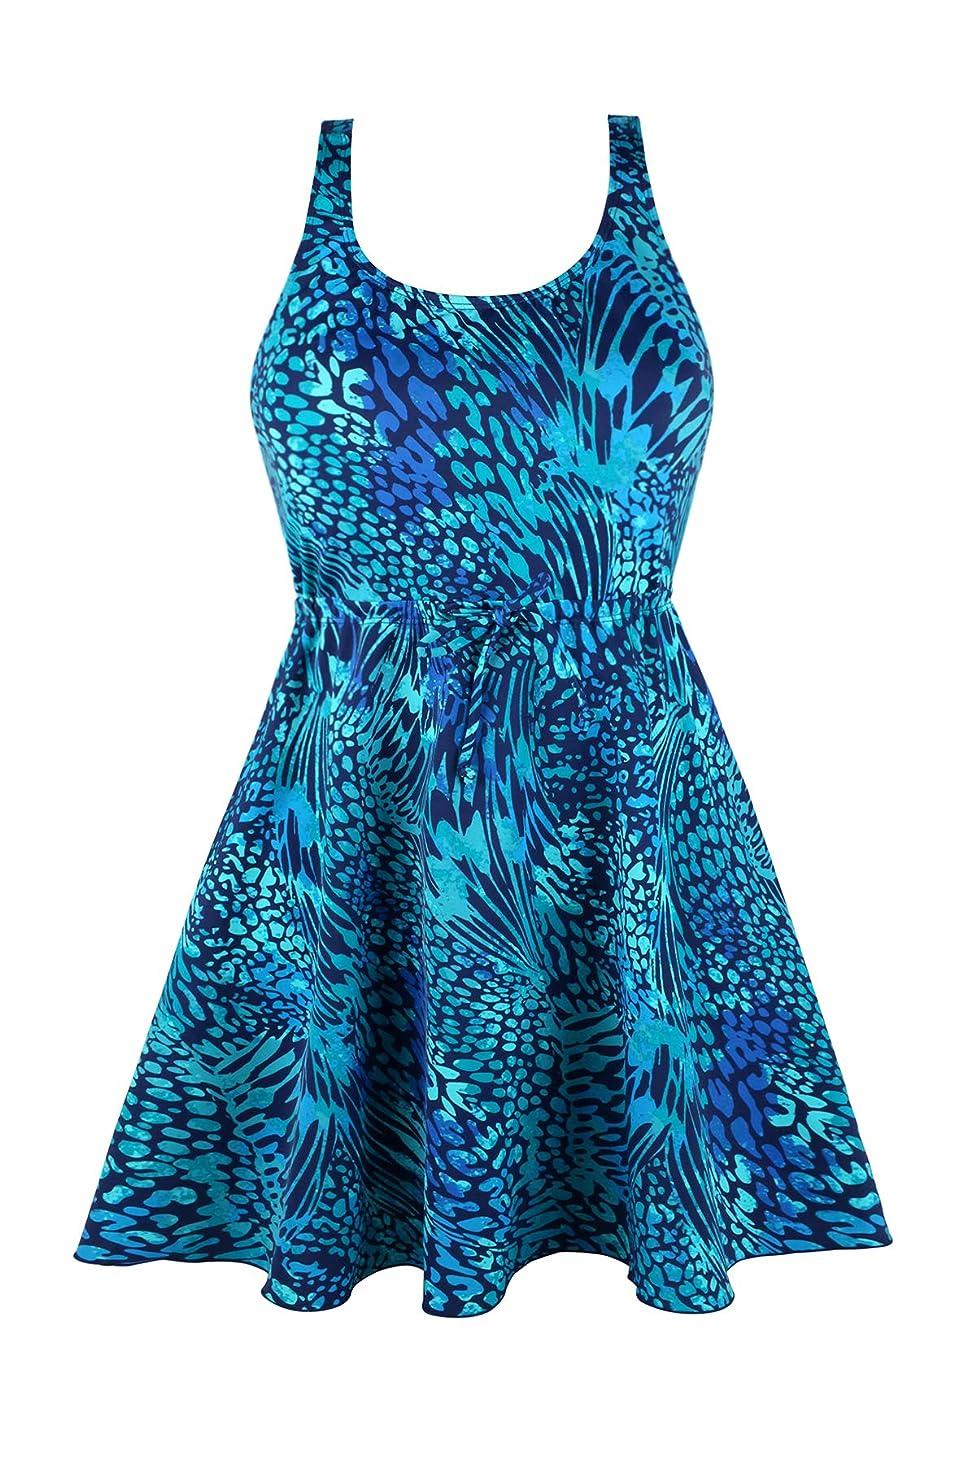 JINXUEER Women's Plus Size Swimsuit One Piece Floral Print Swimwear Tummy Control Swimdress with Flared Skirt